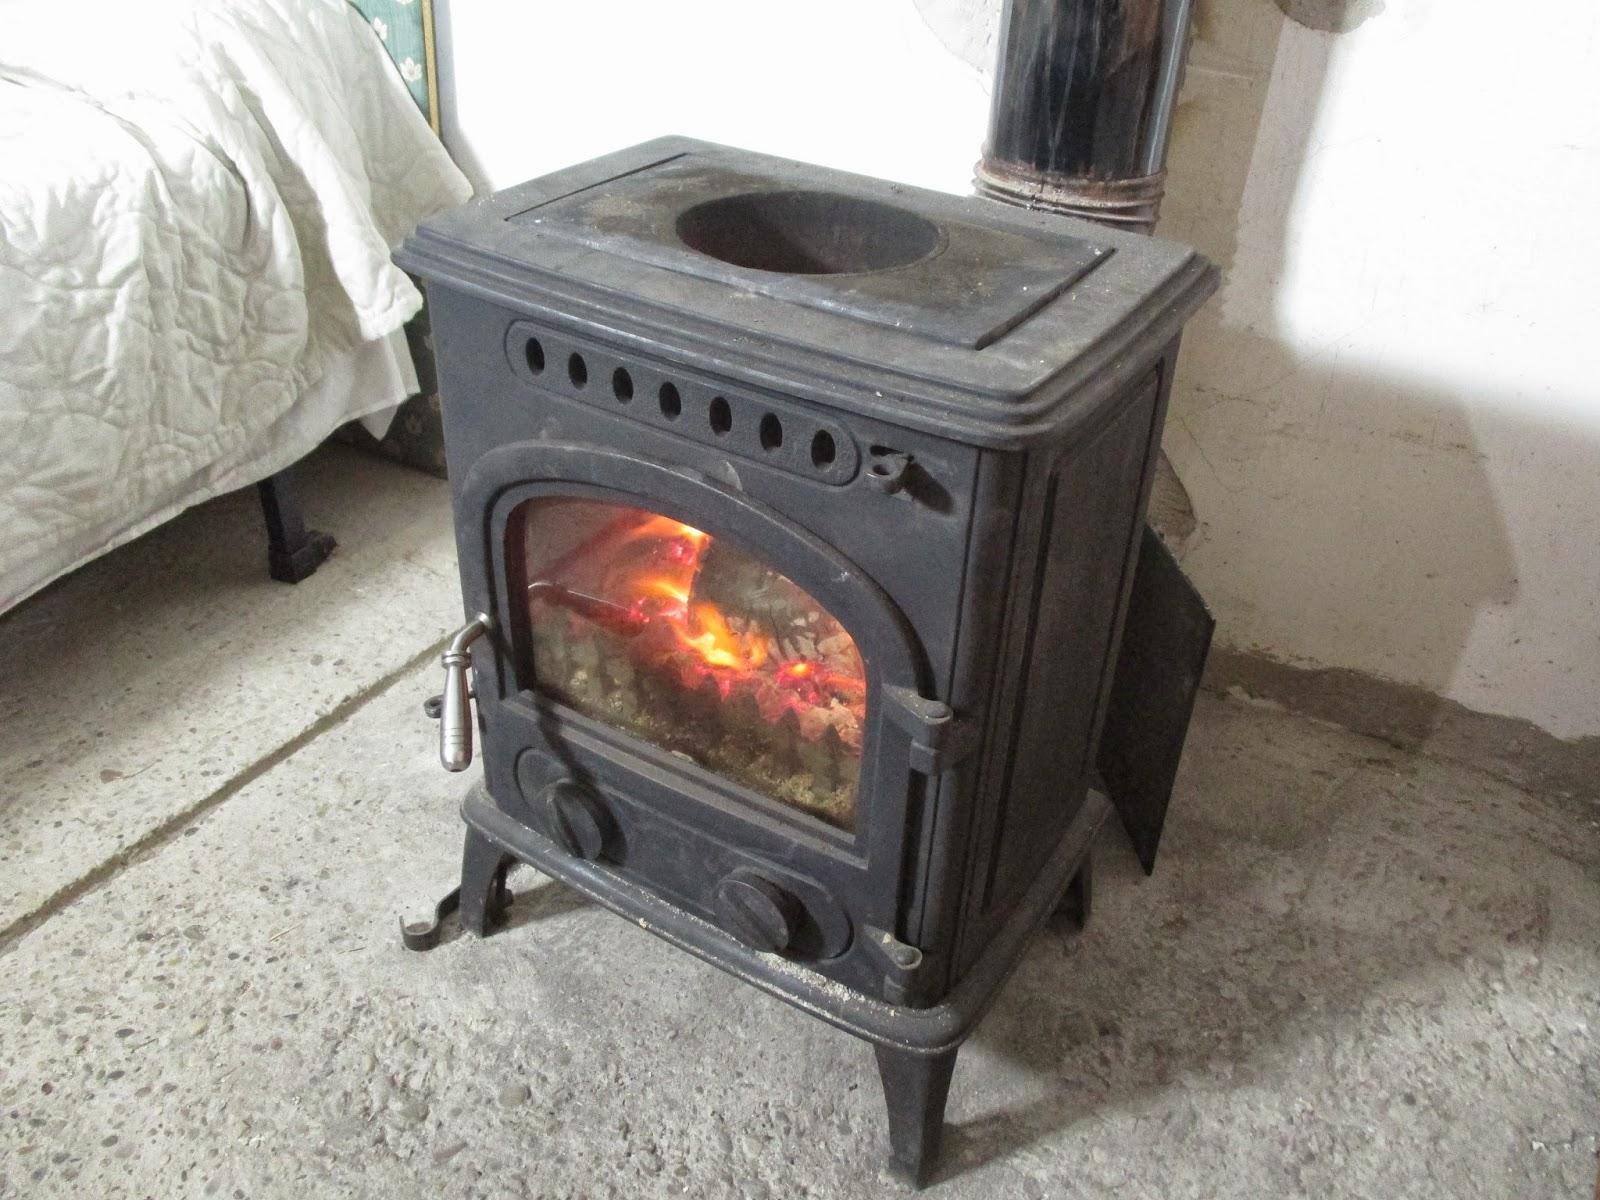 Calor por un tubo estufas de le a - Estufas calefactoras de lena ...